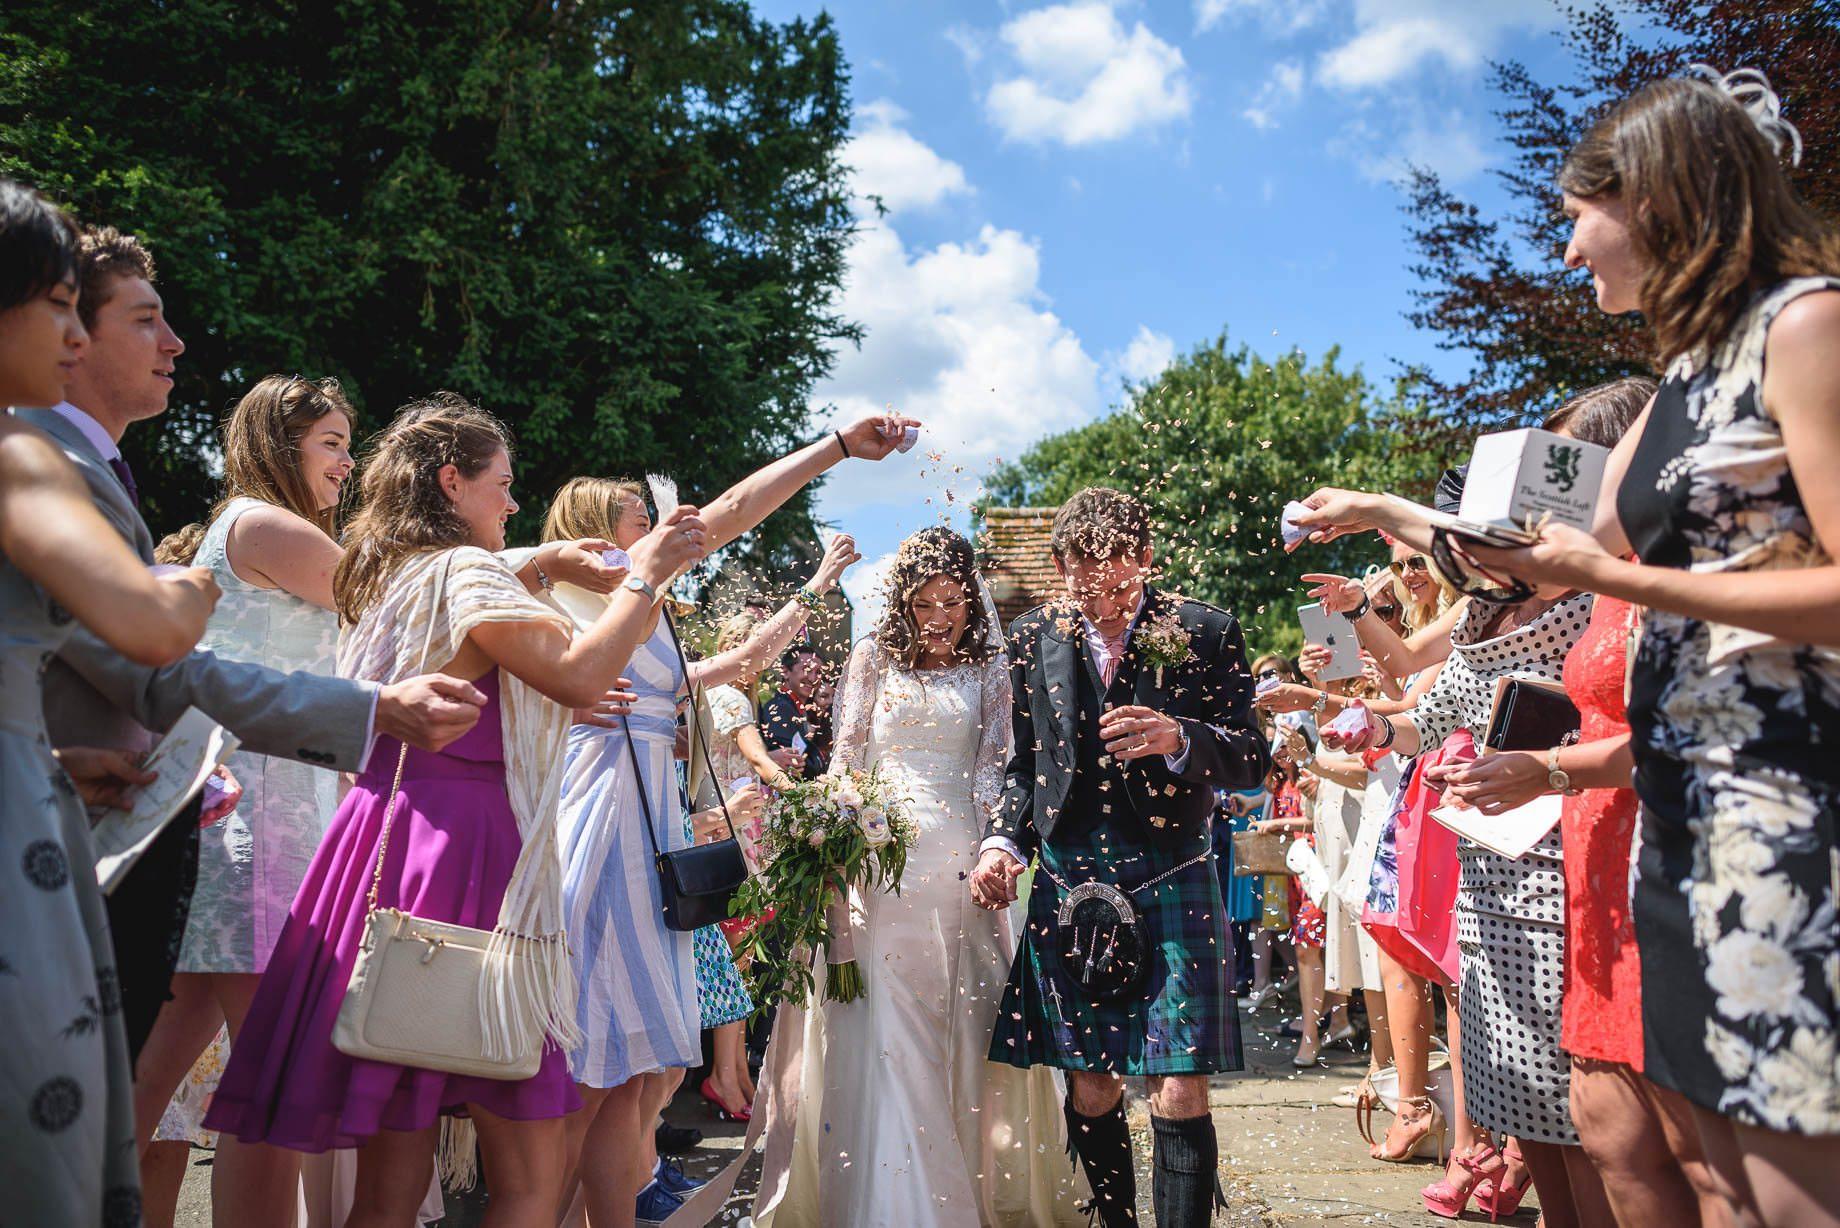 Gildings Barn wedding photography - Sarah and Steve (85 of 190)